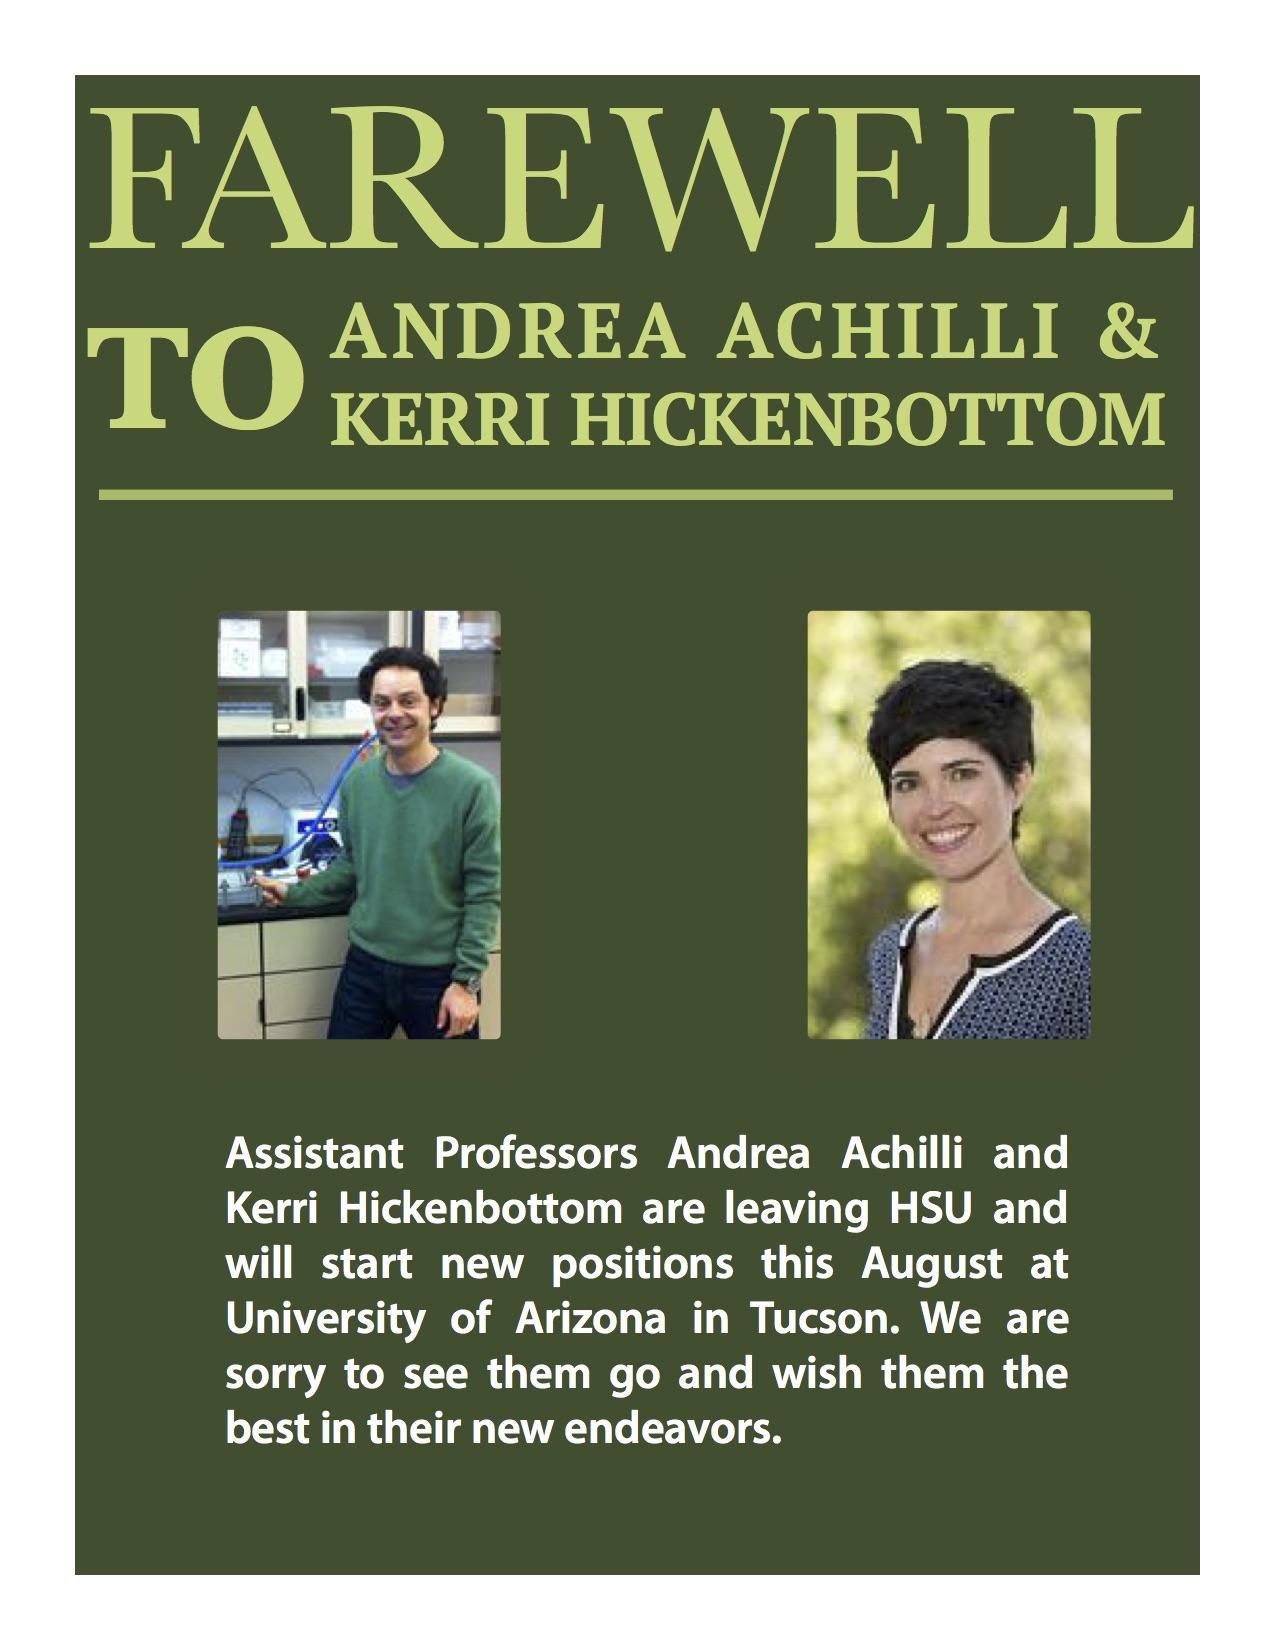 Andrea Achilli and Kerri Hickenbottom leave HSU for University of Arizona